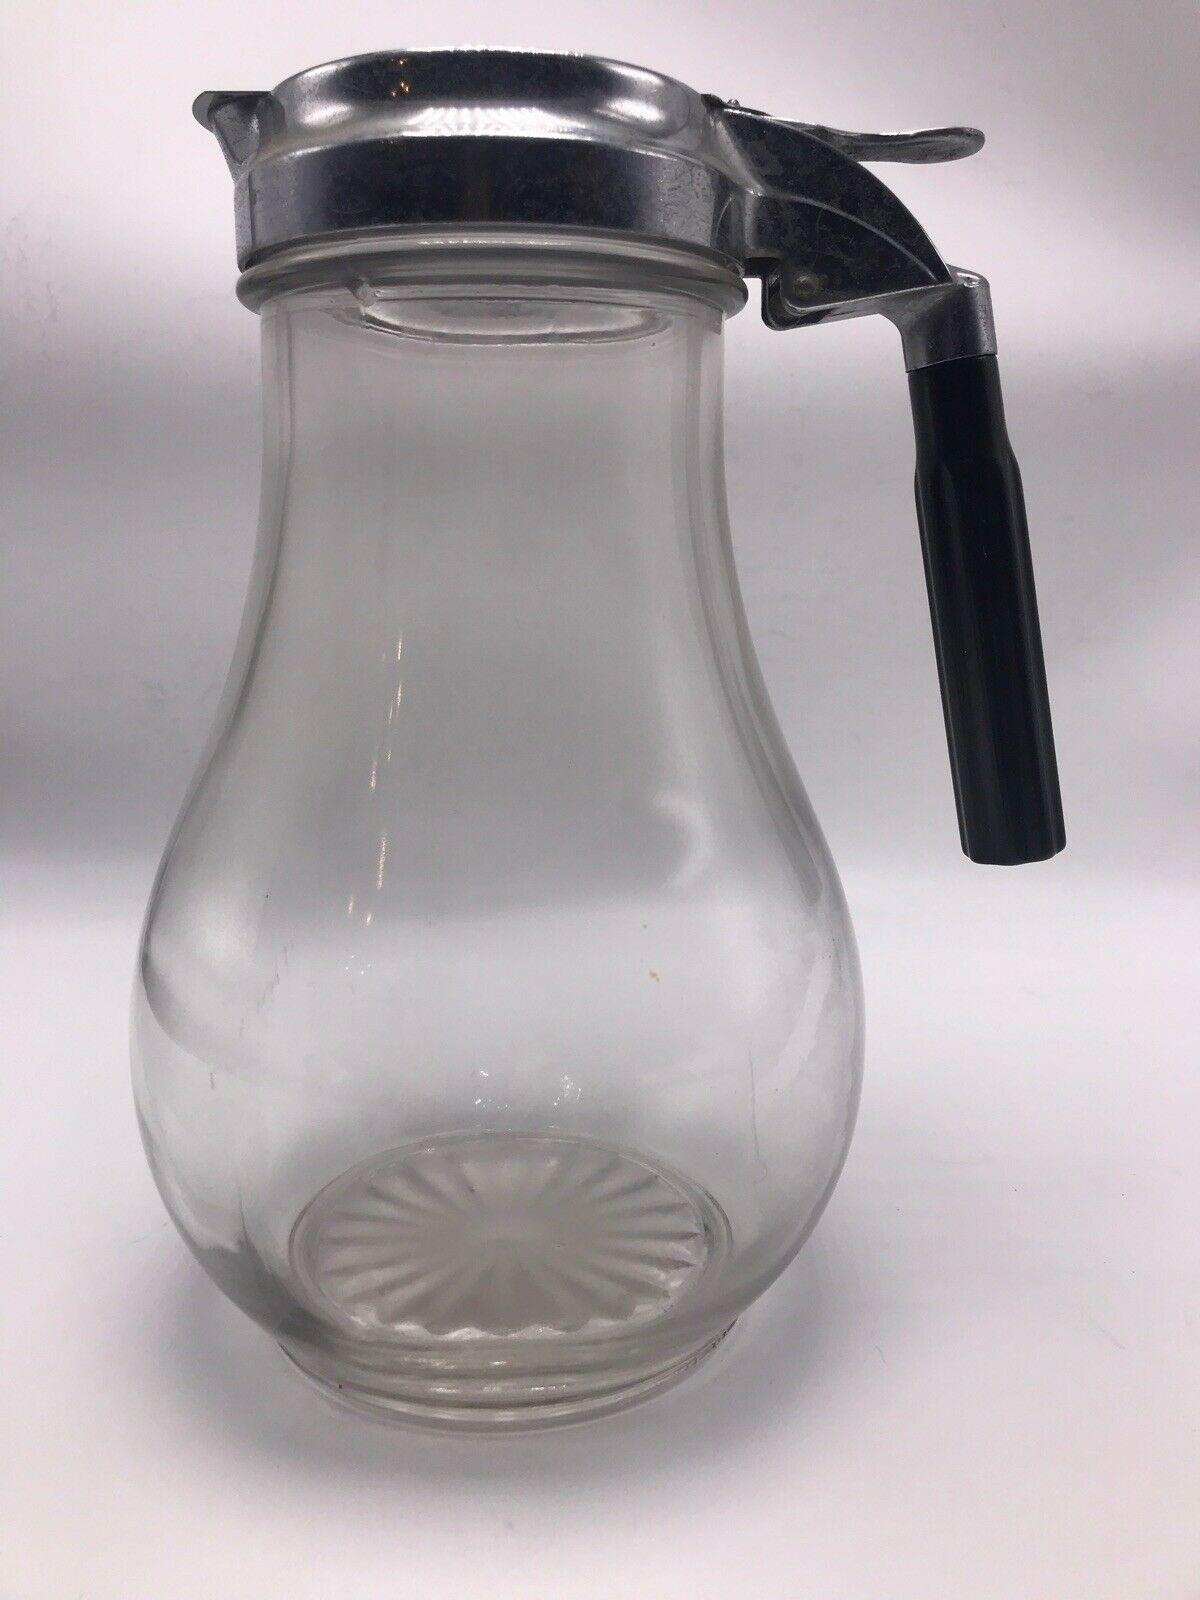 "Glass Pitcher Metal Slide Spout Juice Water Bakelite Handle 8.5"" Vintage 1940's - $30.95"